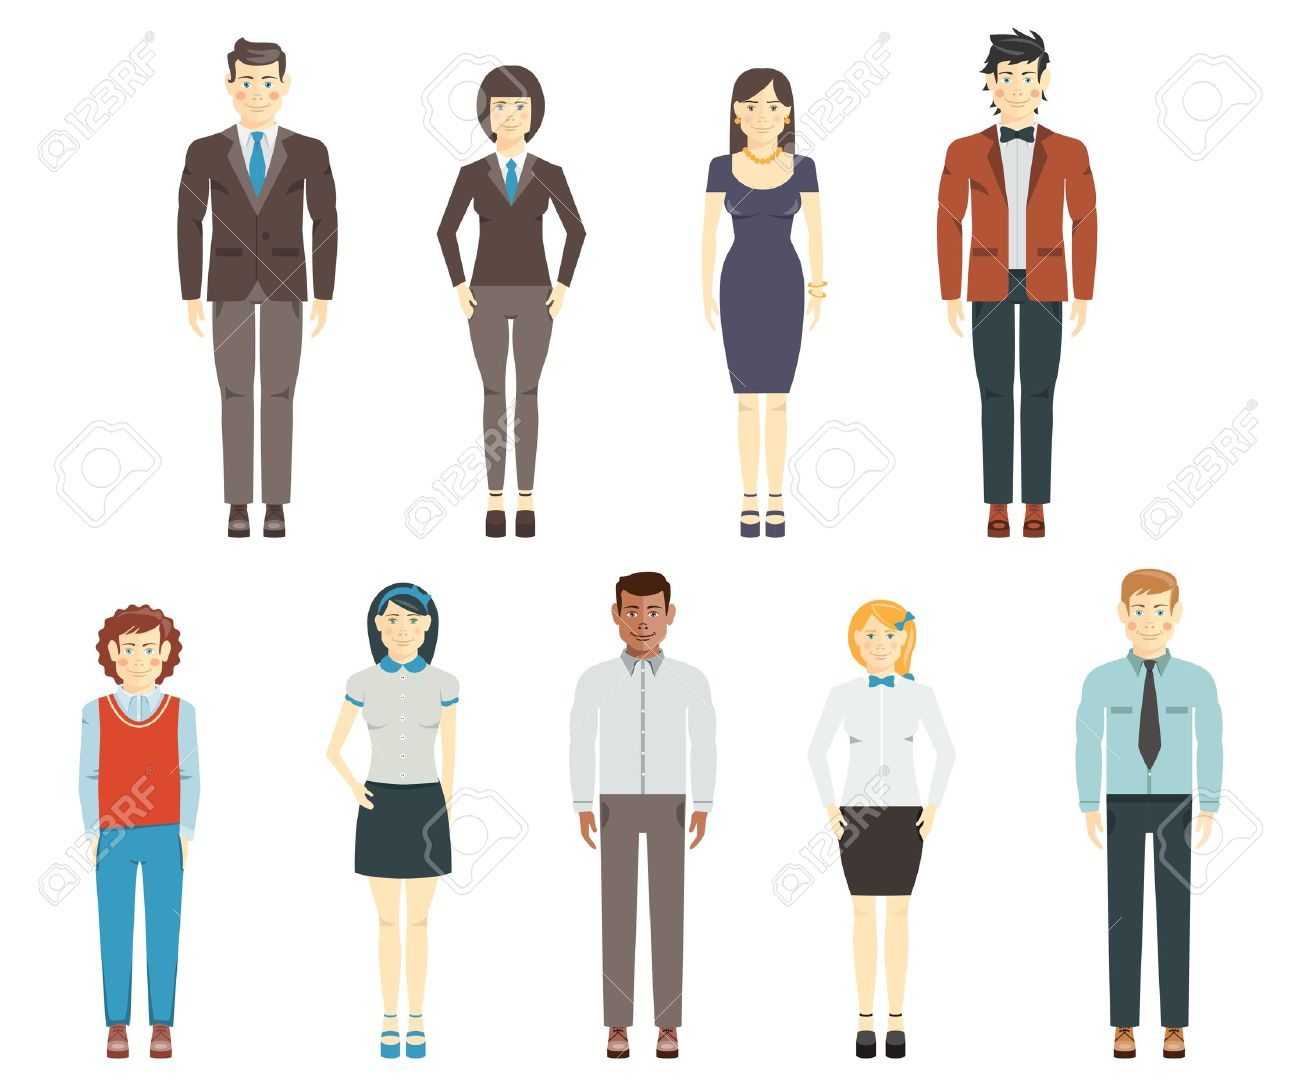 857 Professional Business Dress Women Stock Illustrations.